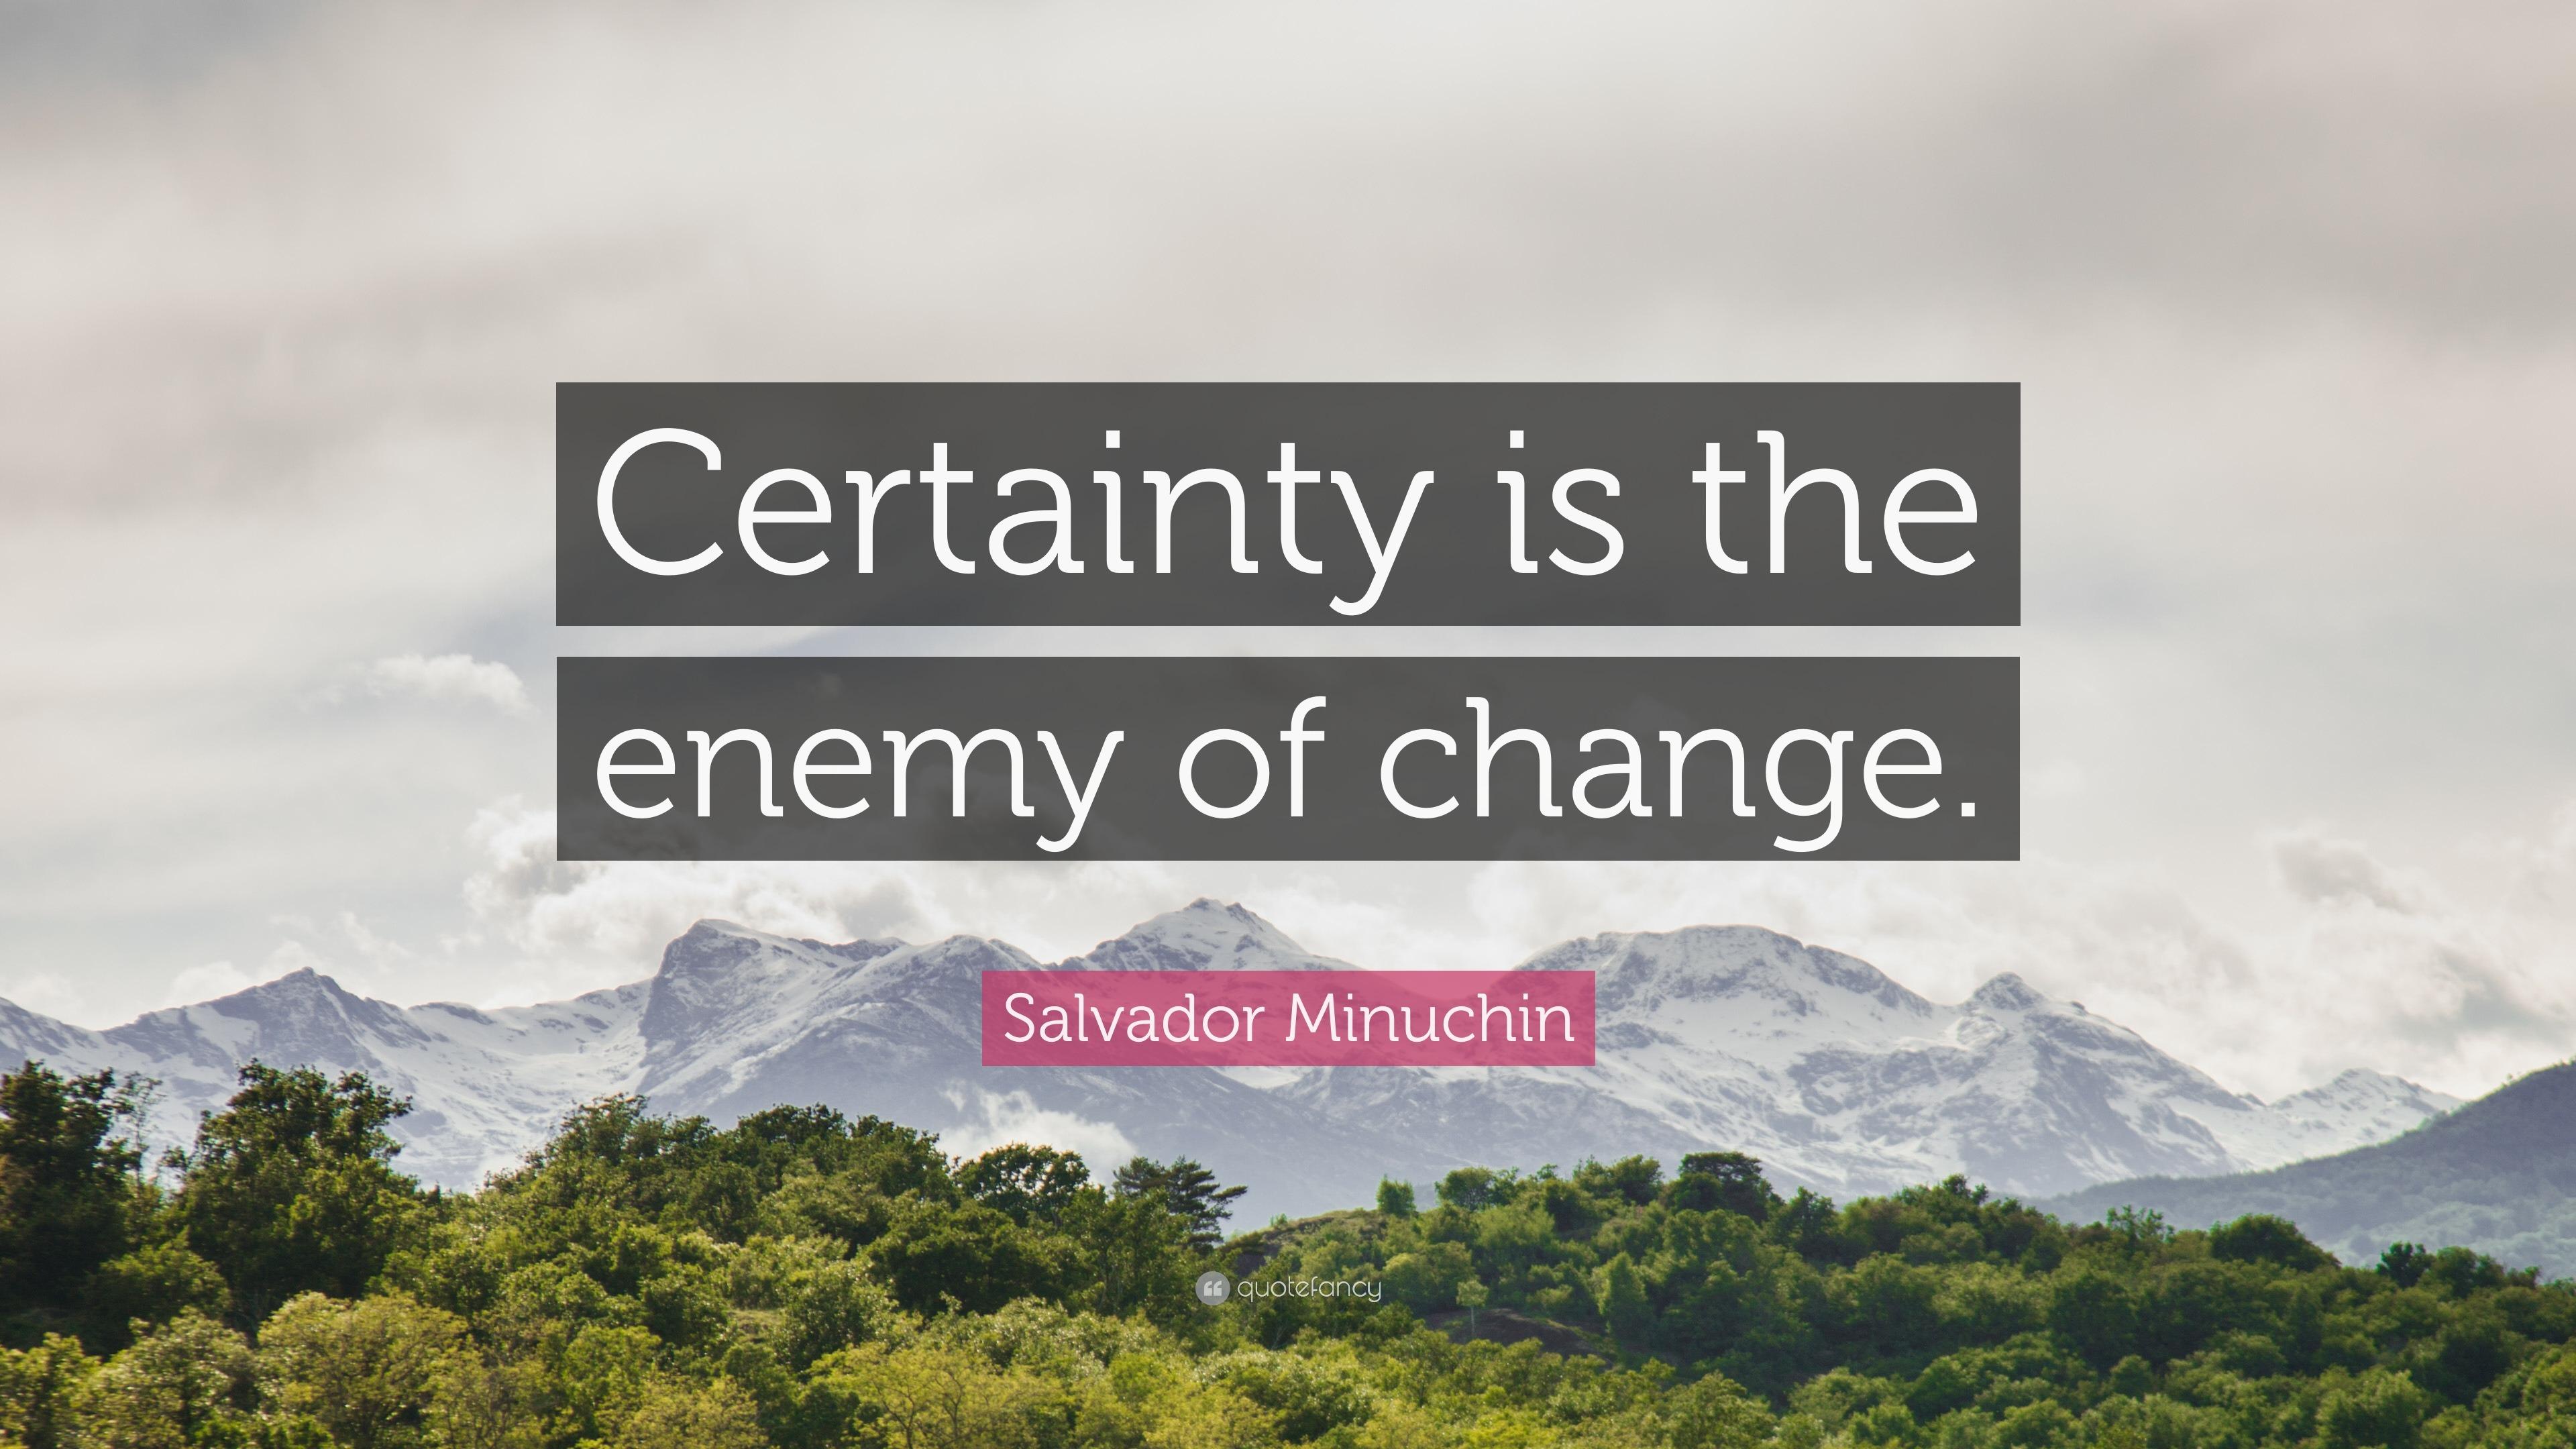 Salvador Minuchin Quotes (5 wallpapers) - Quotefancy